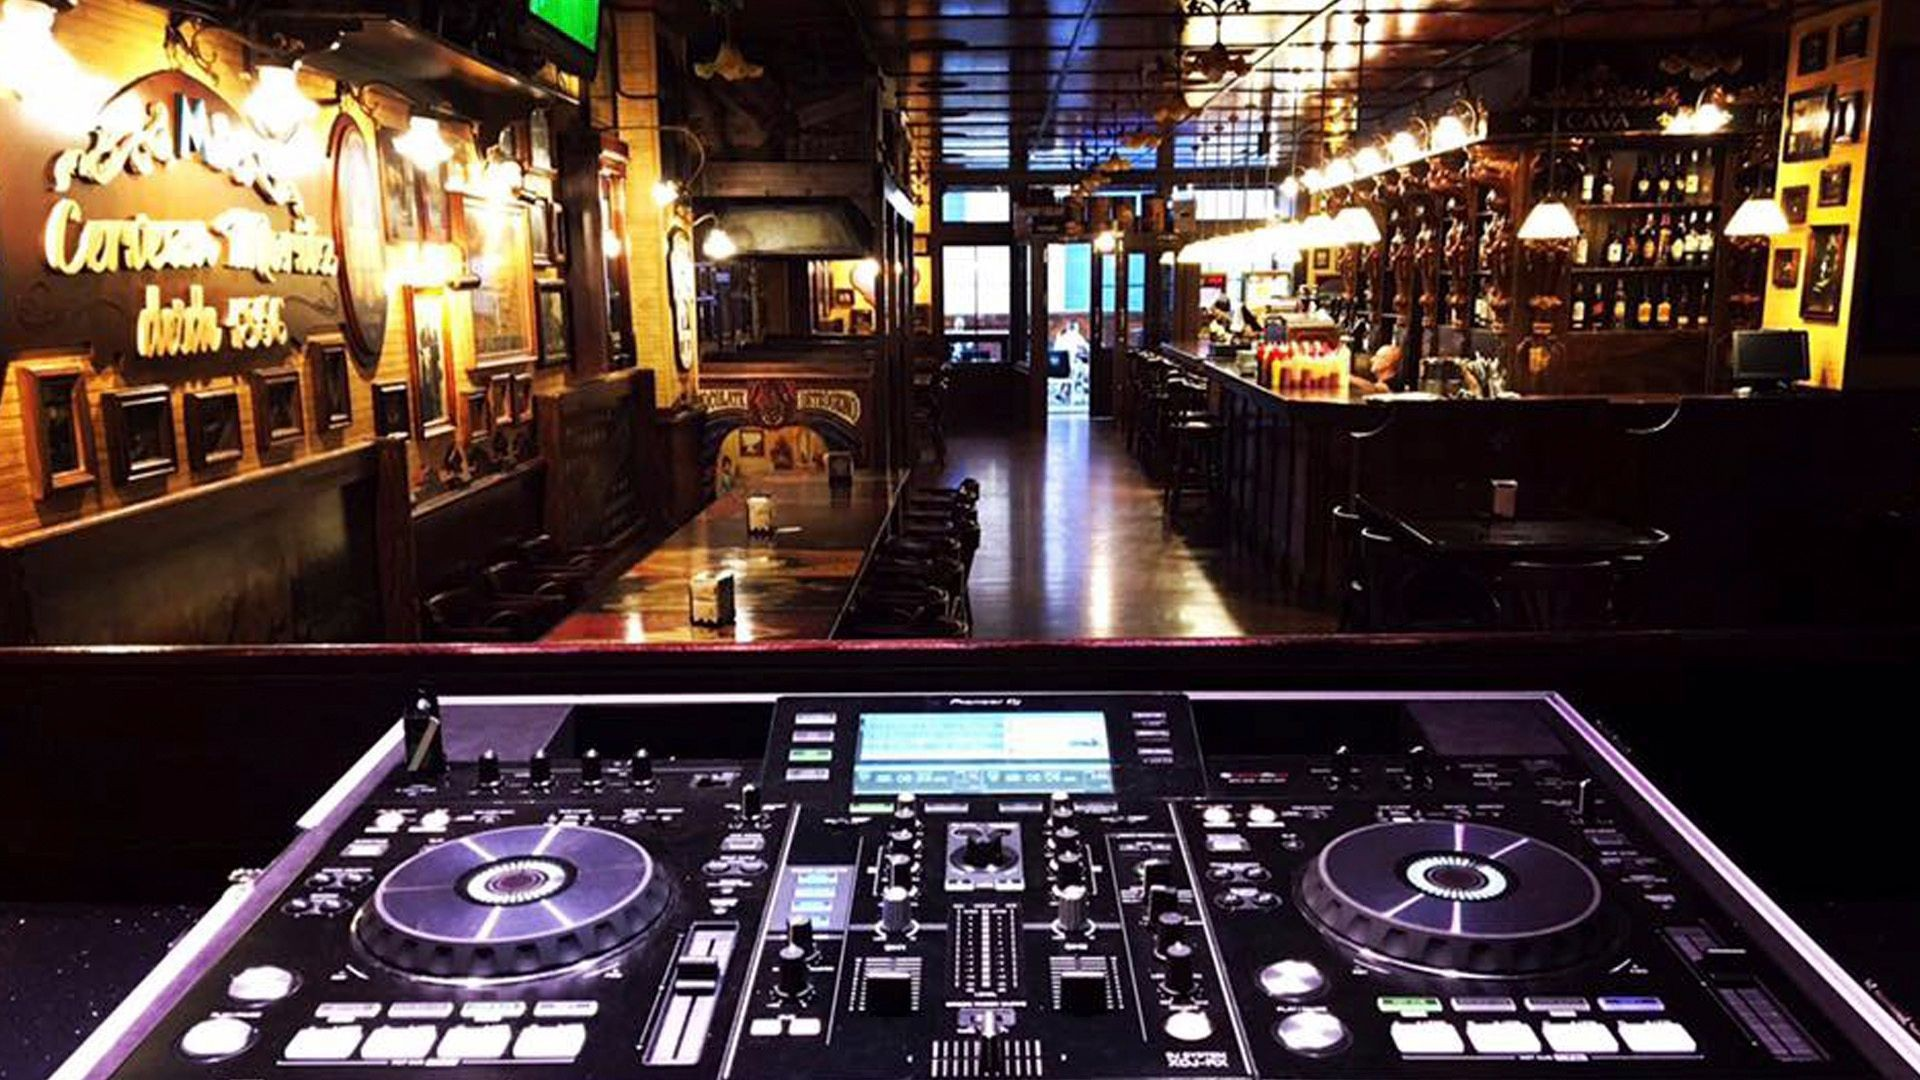 Pub cervecería en Mataro con música en directo